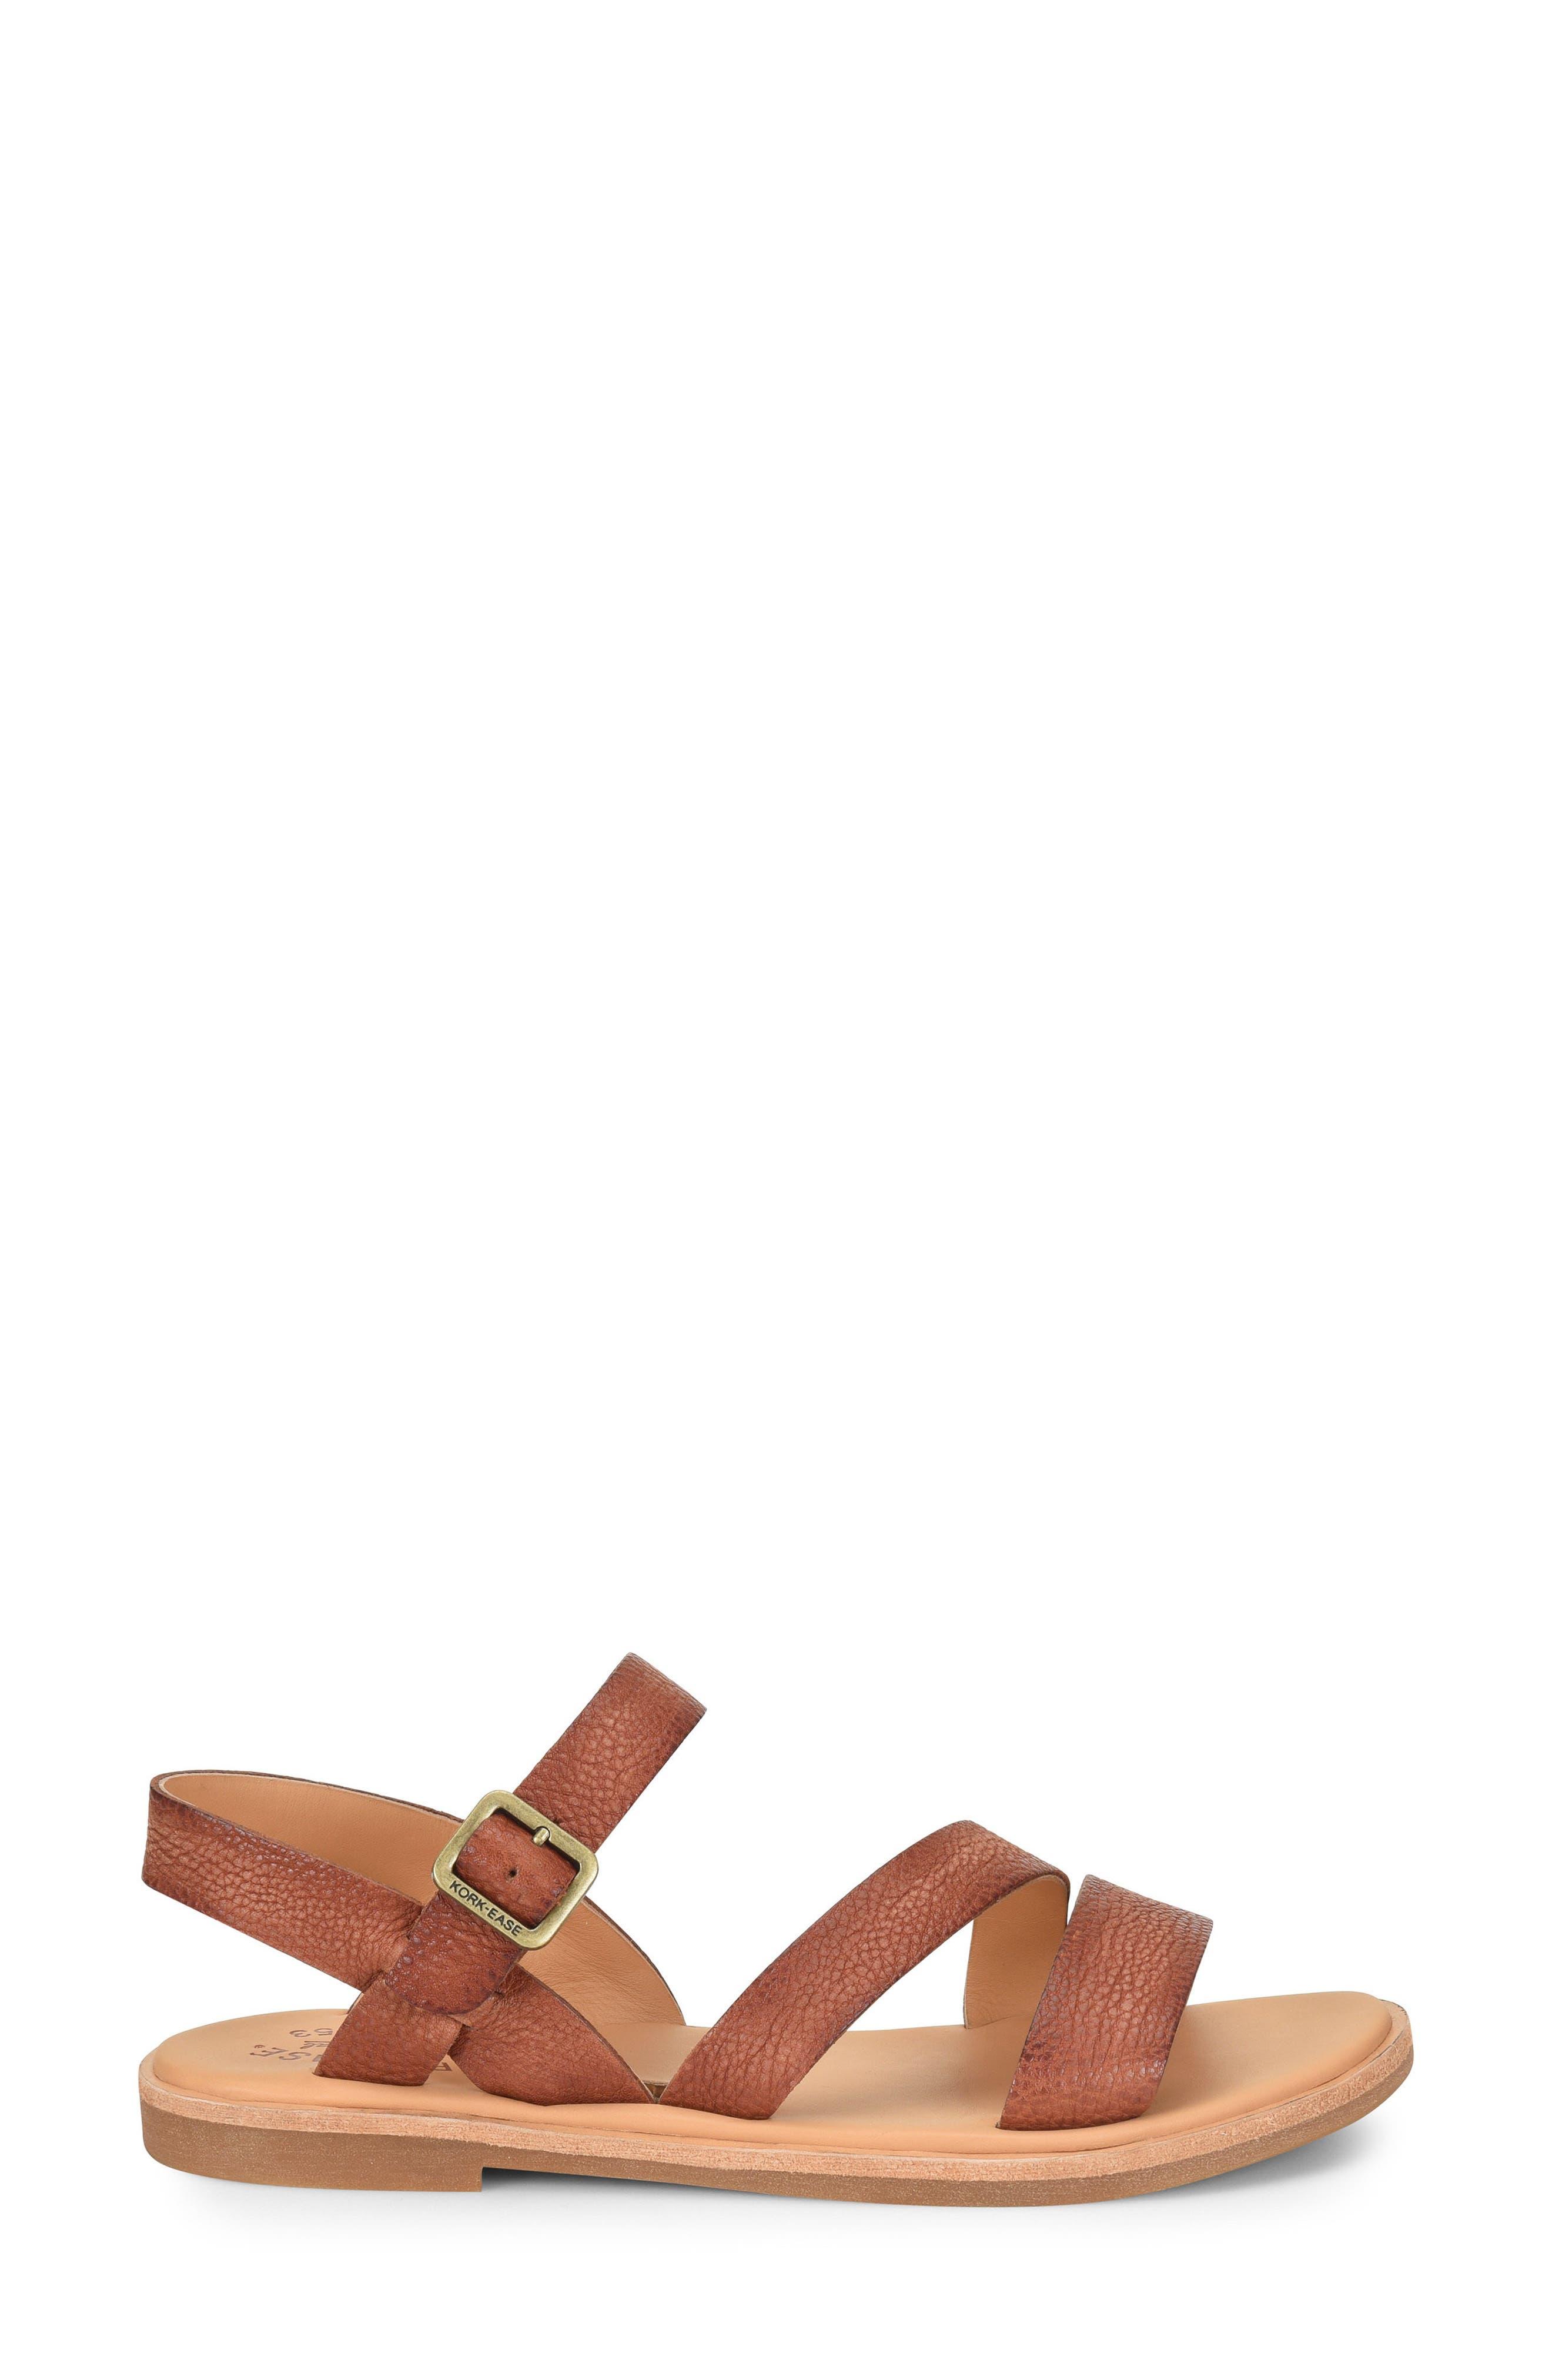 Nogales Sandal,                             Alternate thumbnail 3, color,                             Brown Leather